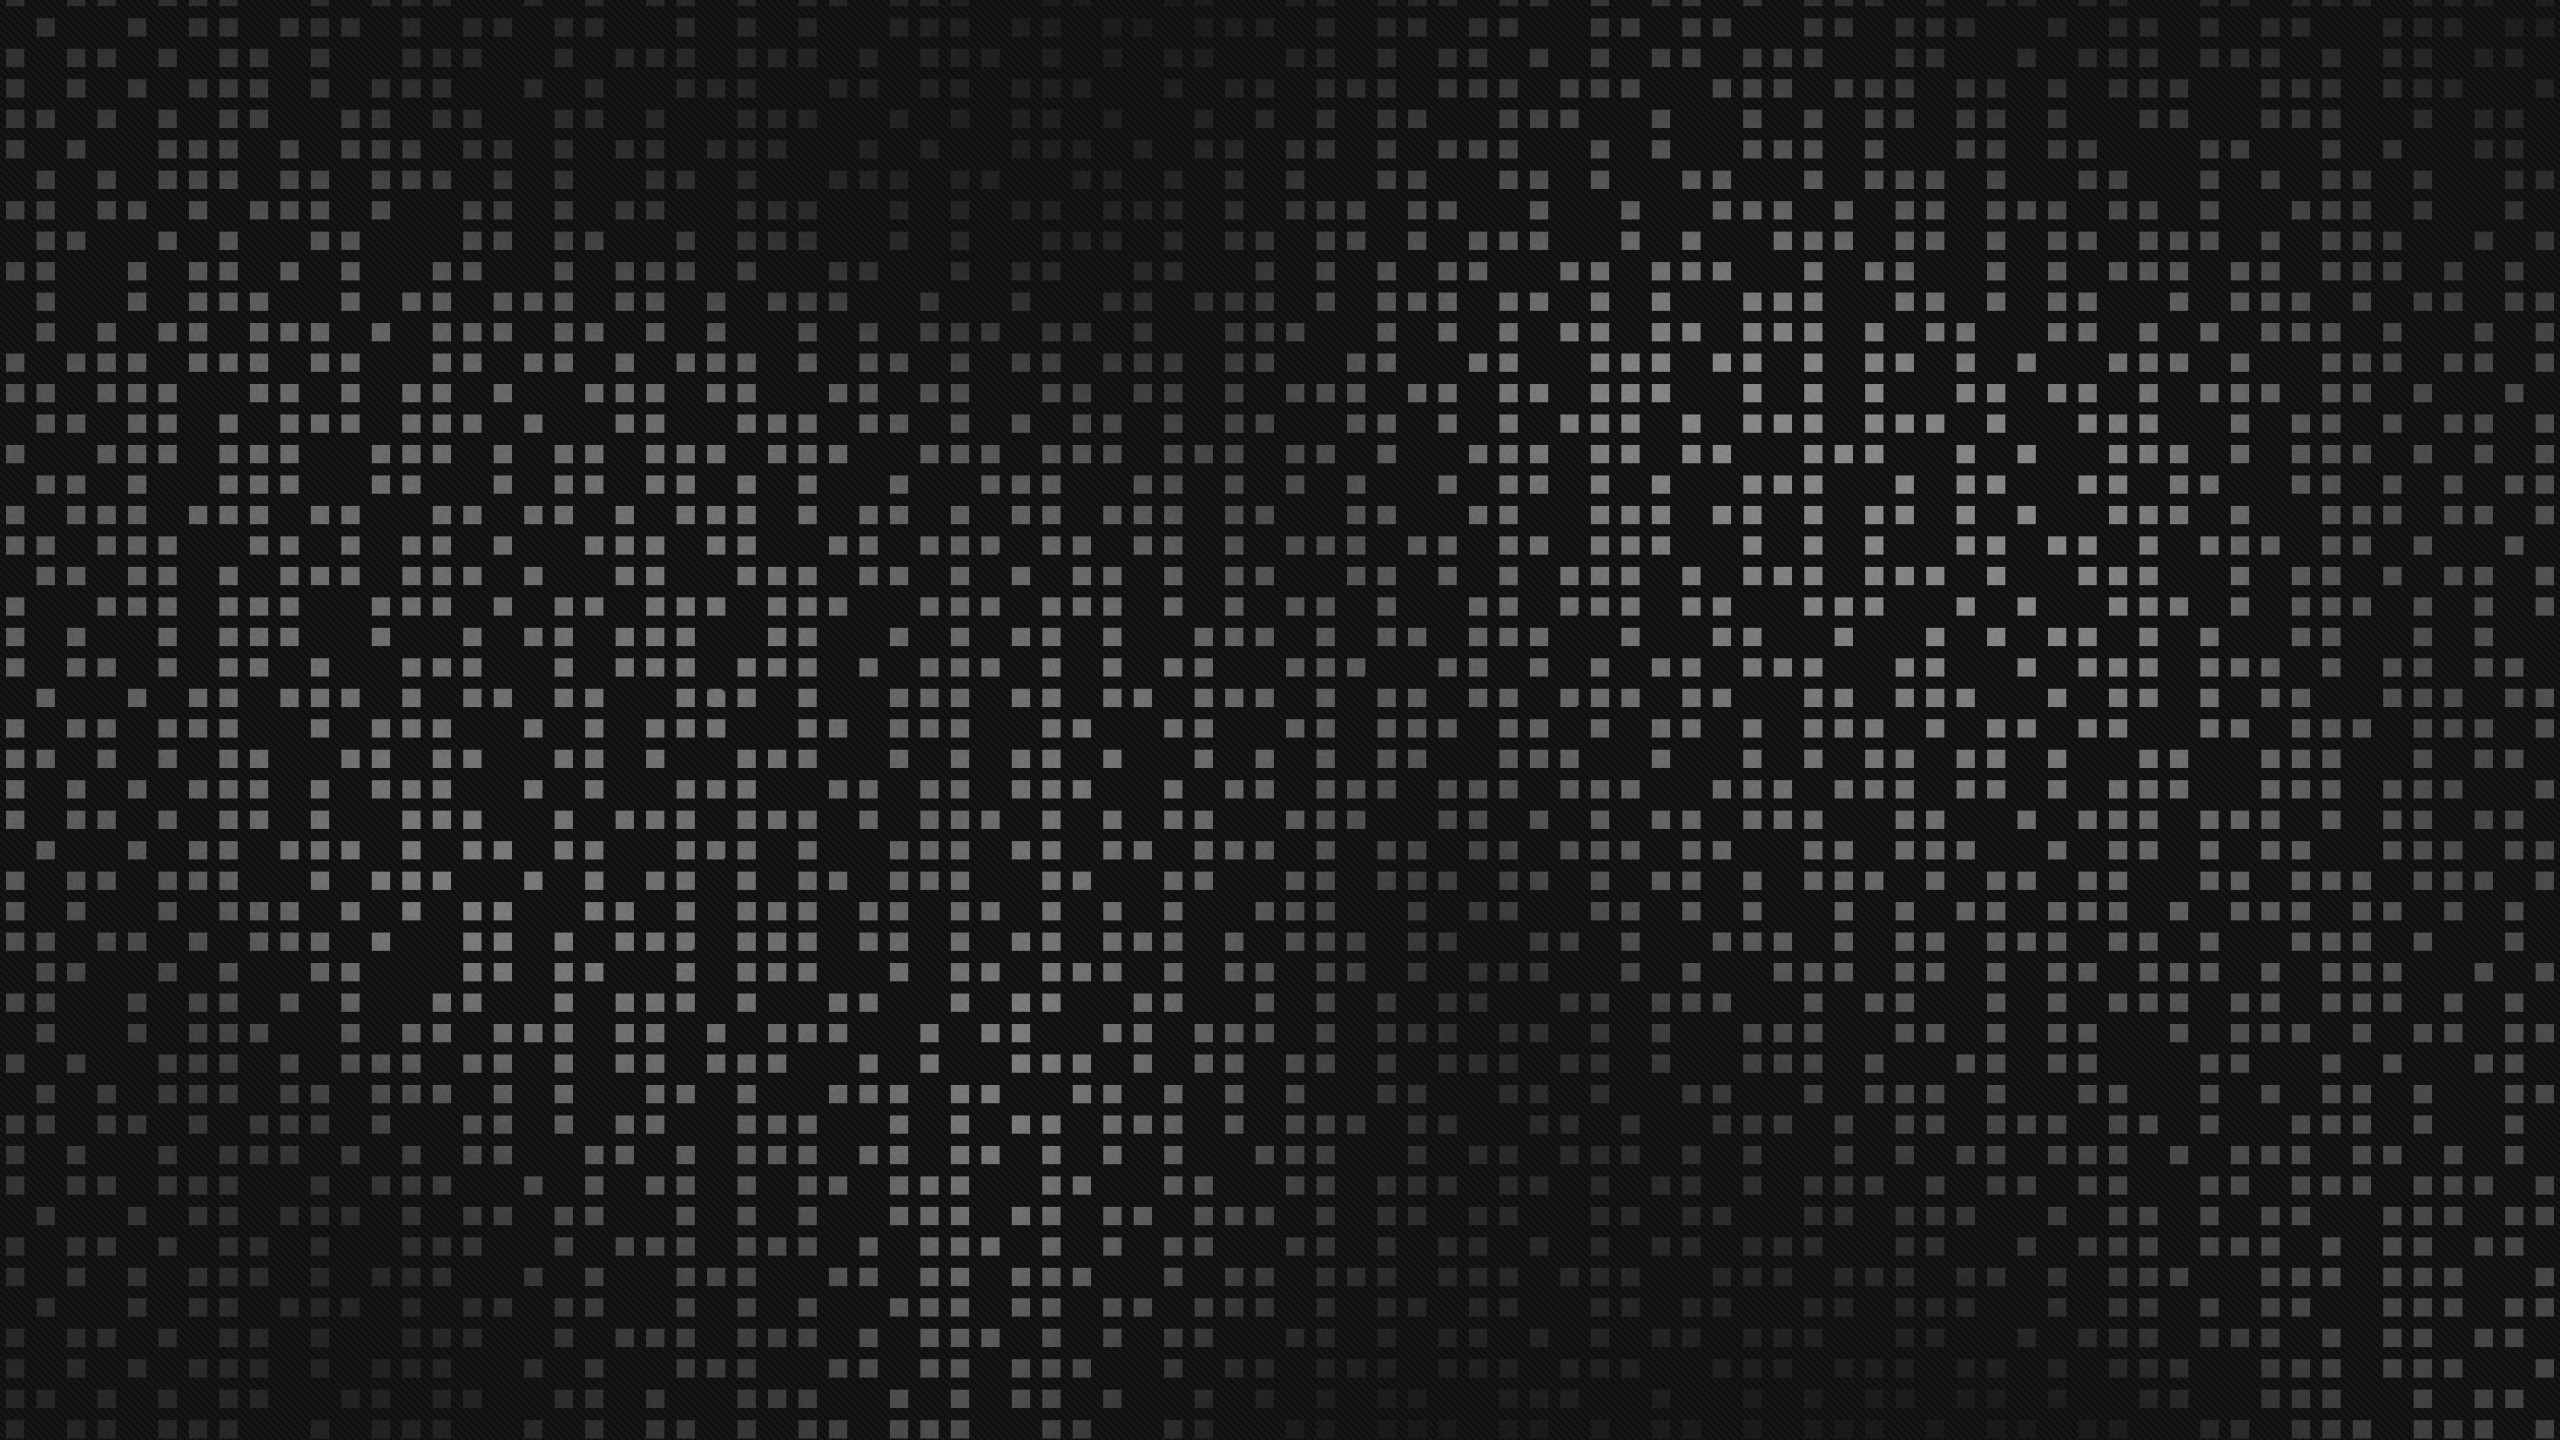 Wallpaper Phone Wallpapers #2760 Wallpaper | Wallpaperyup .